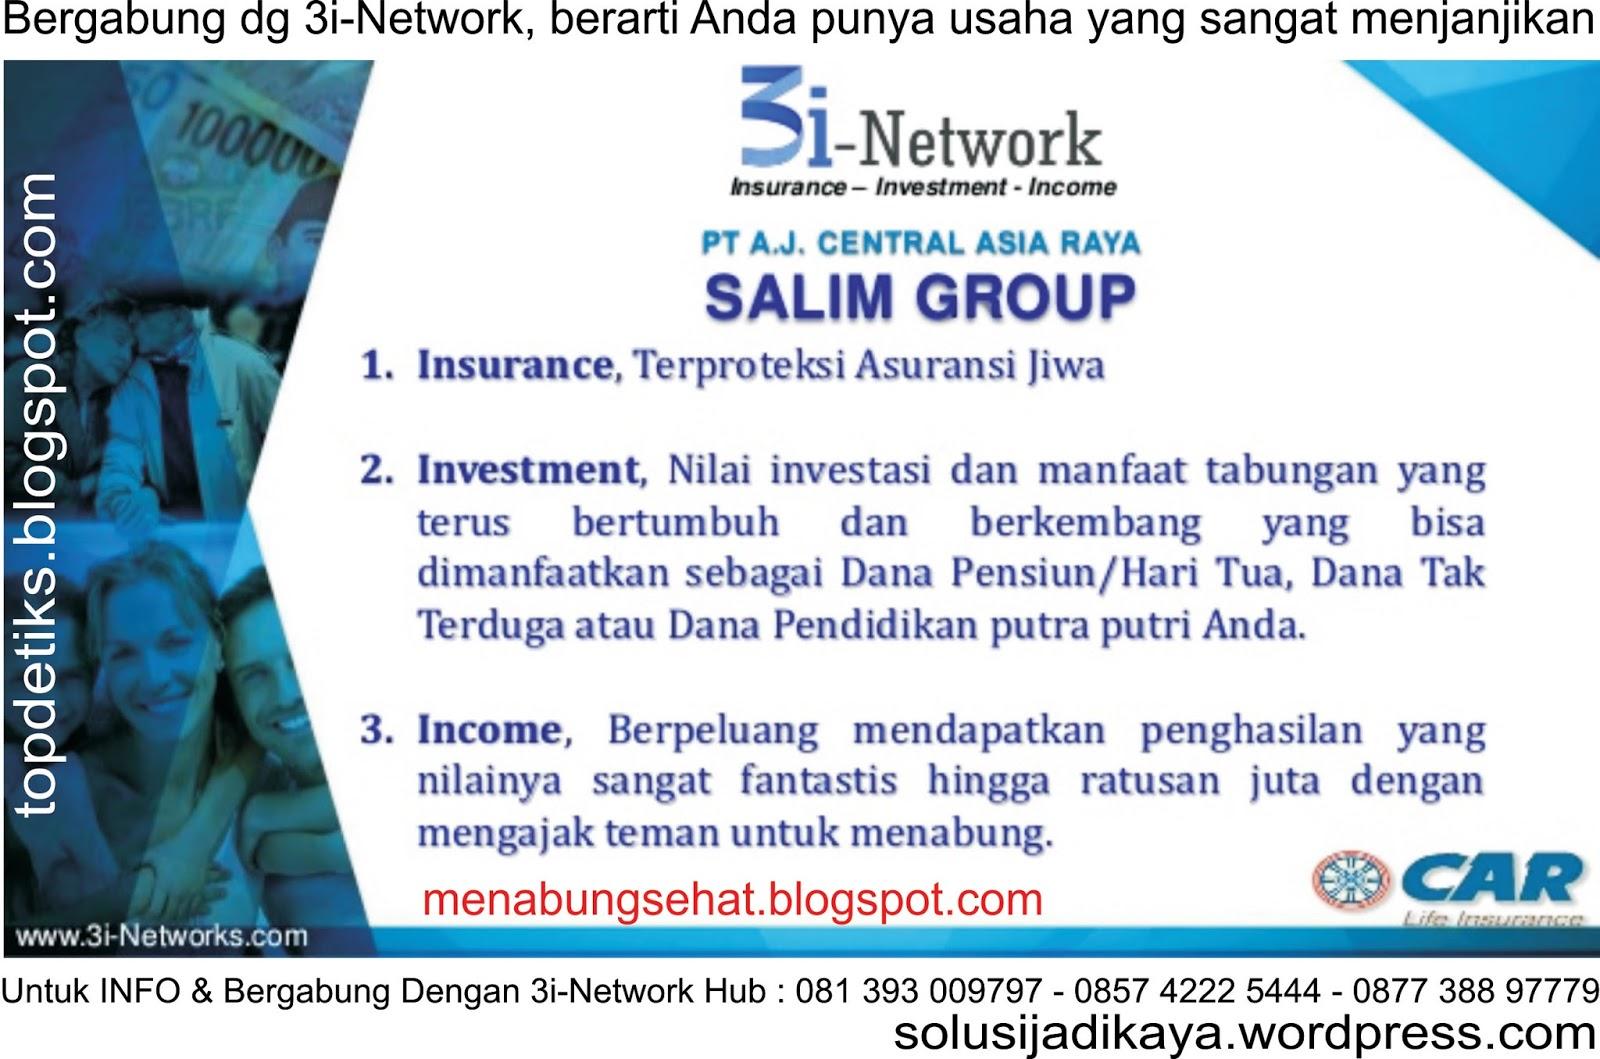 Alamat Baja Ringan Bandung Bengkel, Montir, Teknisi, Komputer, Elektro, Pcb, Ac ...